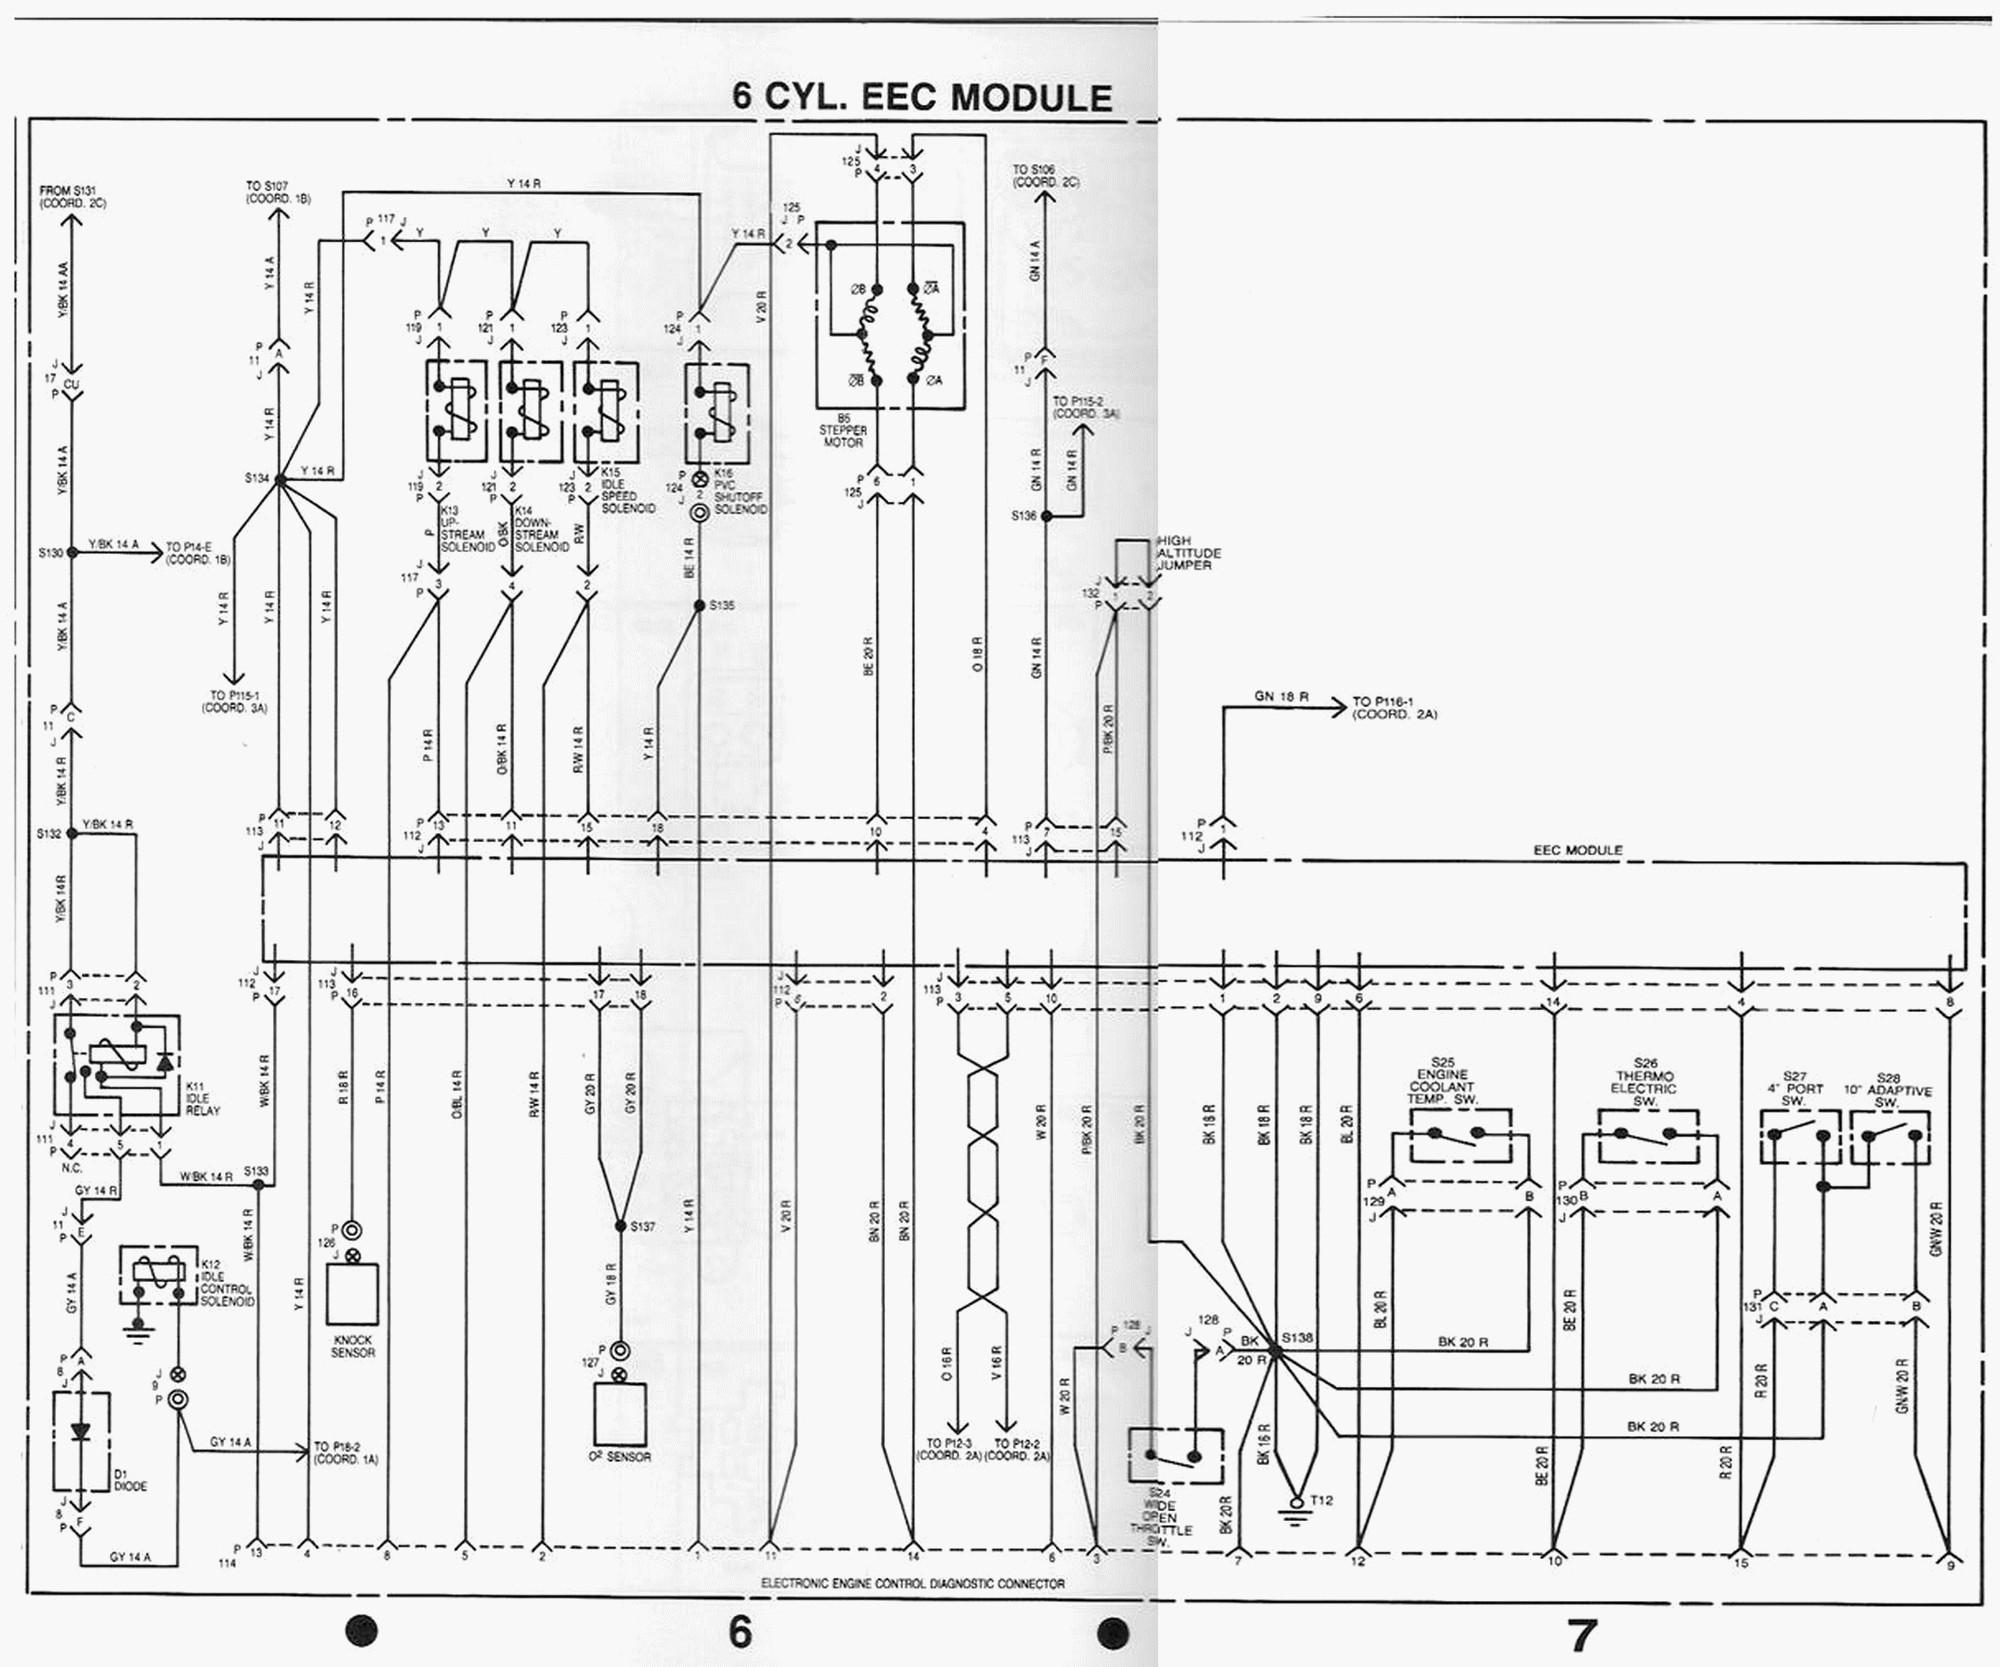 Amc Eagle Wiper Switch Diagram : 30 Wiring Diagram Images